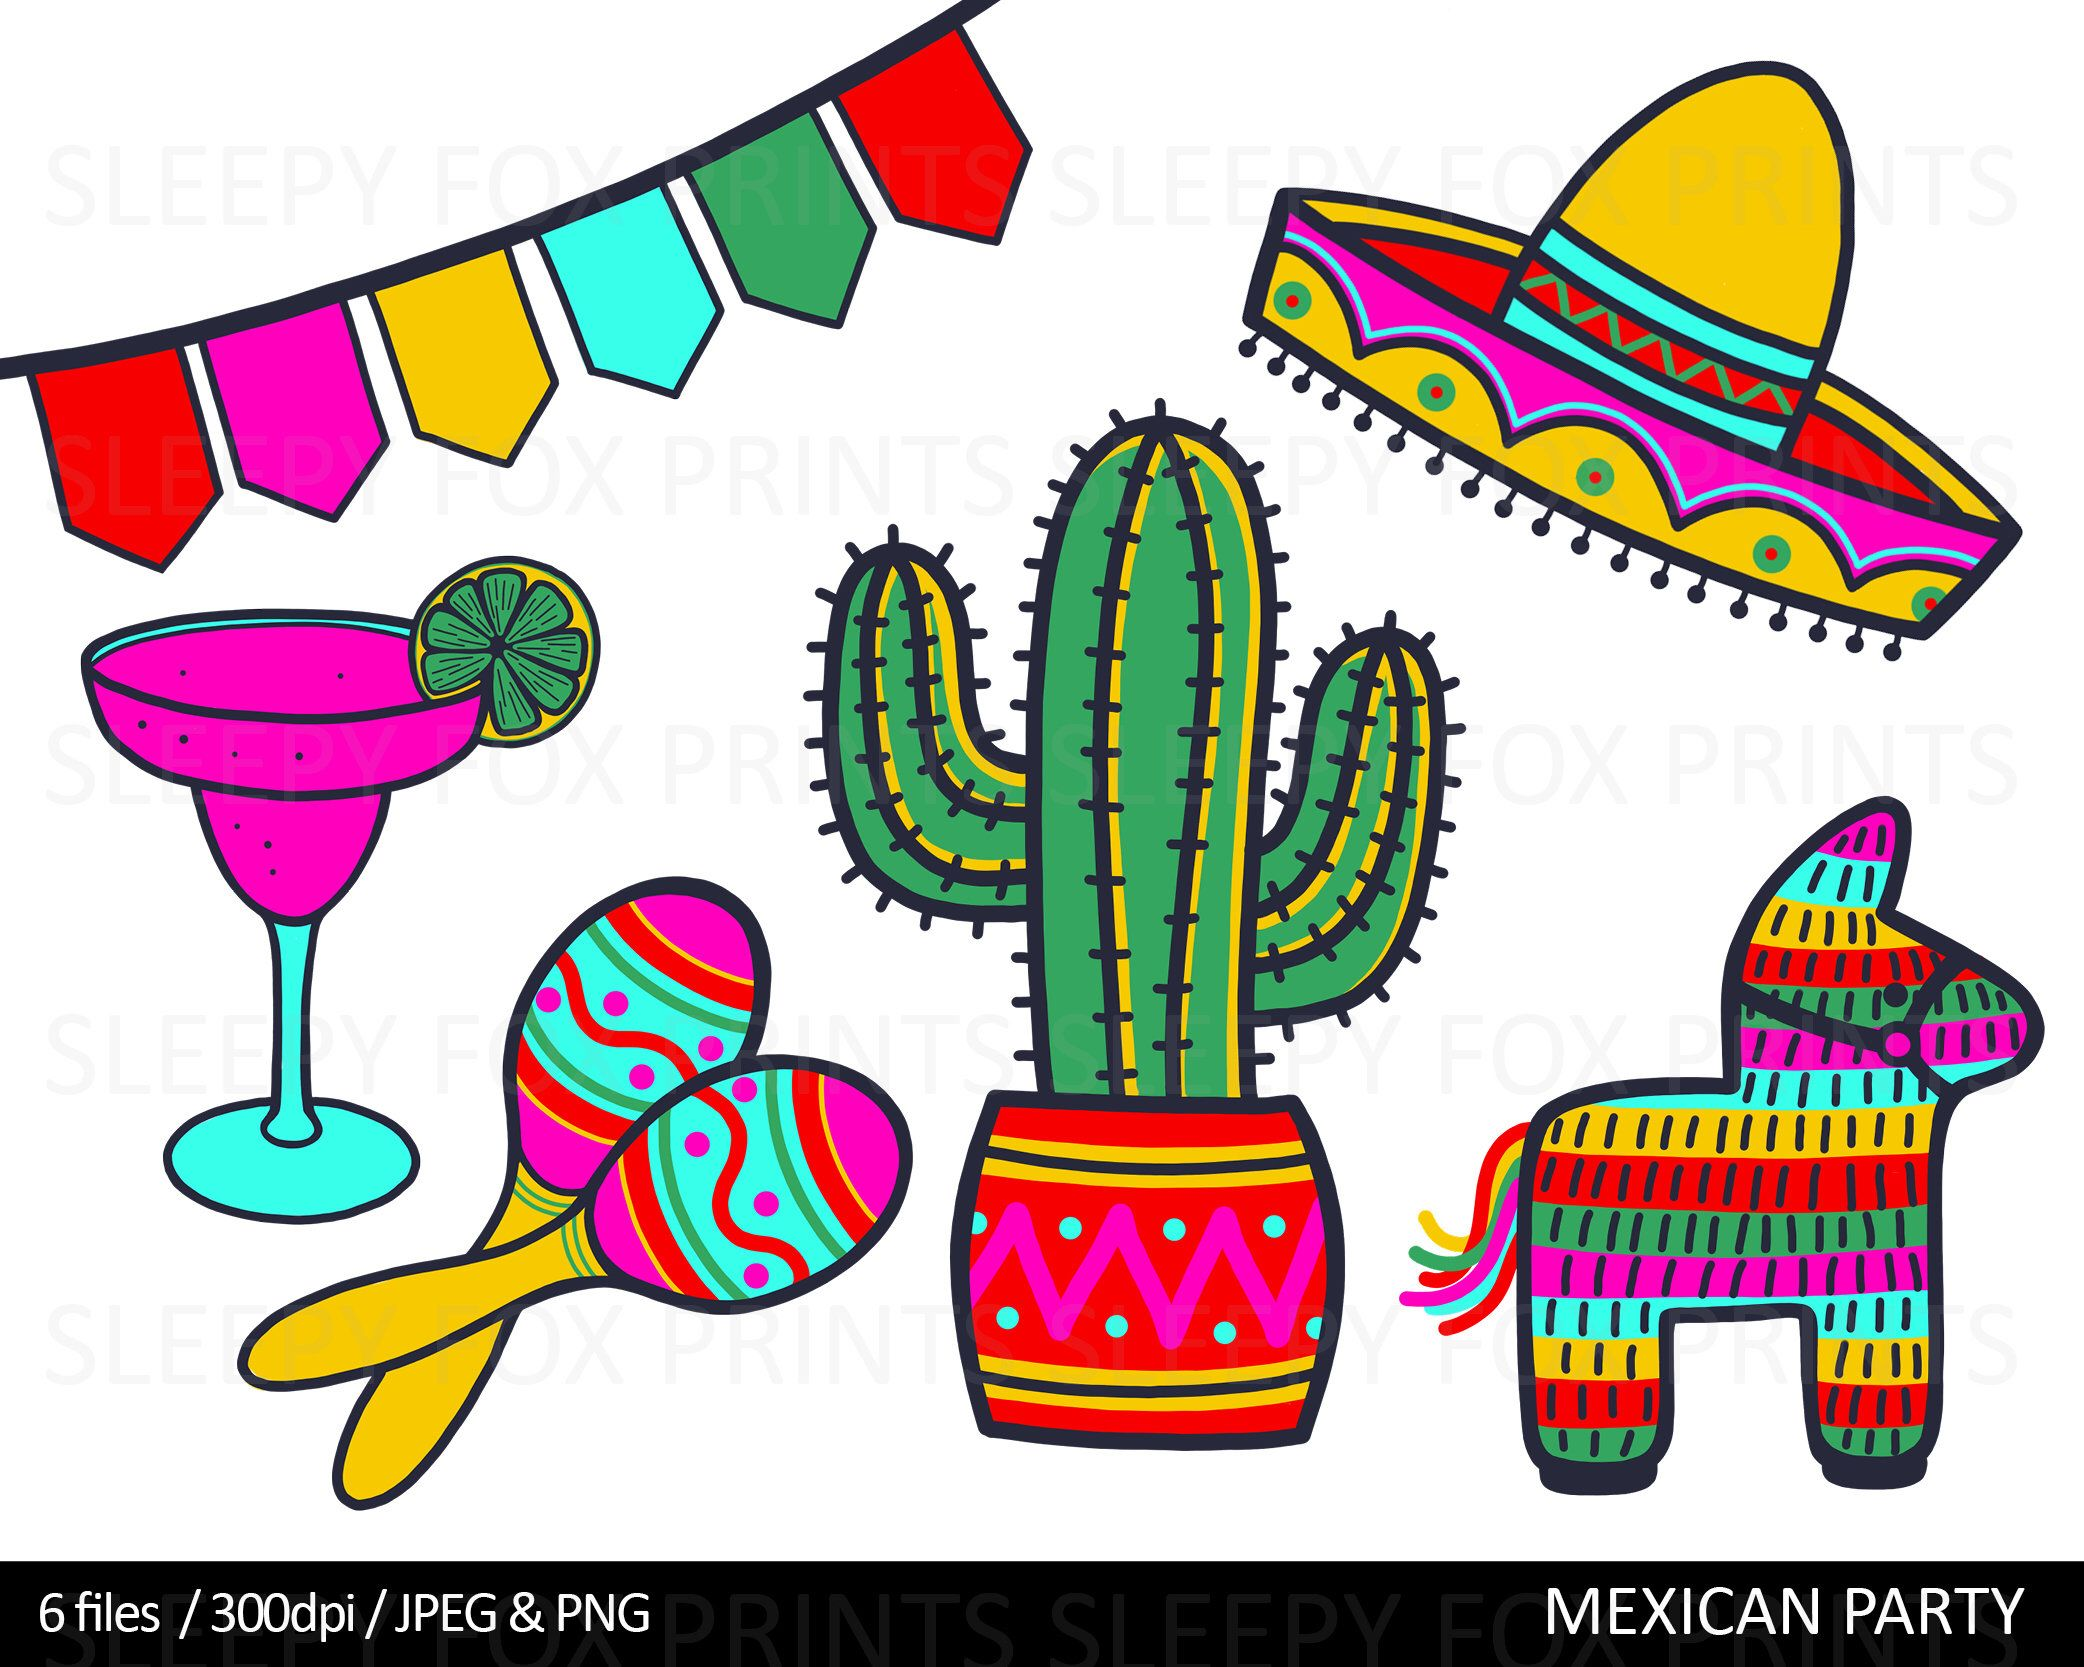 Mexican Fiesta Party Clip Art Mexico Clipart Cactus Etsy Fiesta Dibujo Gorro Mexicano Dibujos De Sombreros